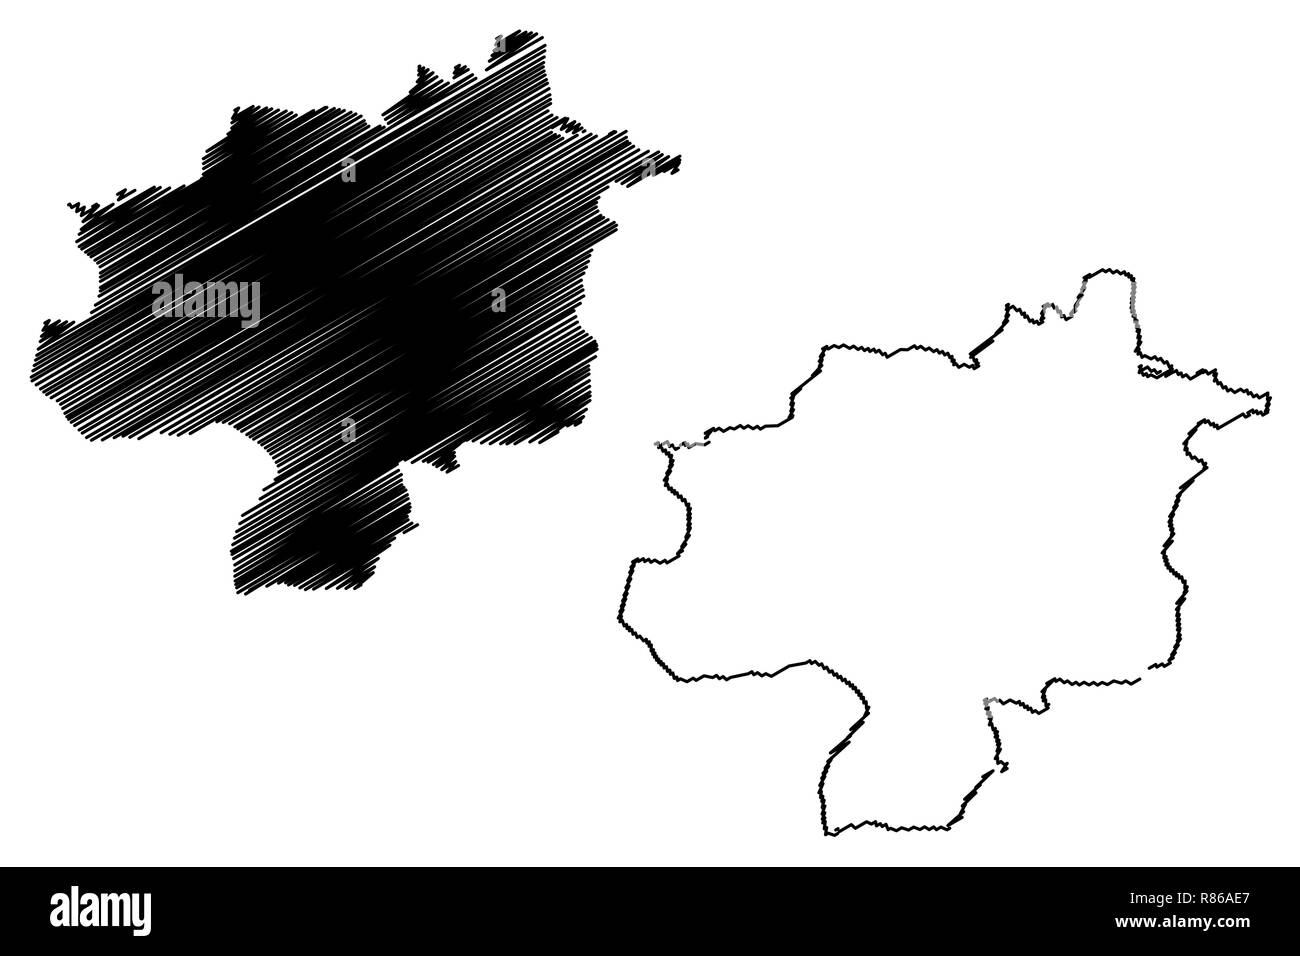 Sivas (Provinces of the Republic of Turkey) map vector illustration, scribble sketch Sivas ili map - Stock Image